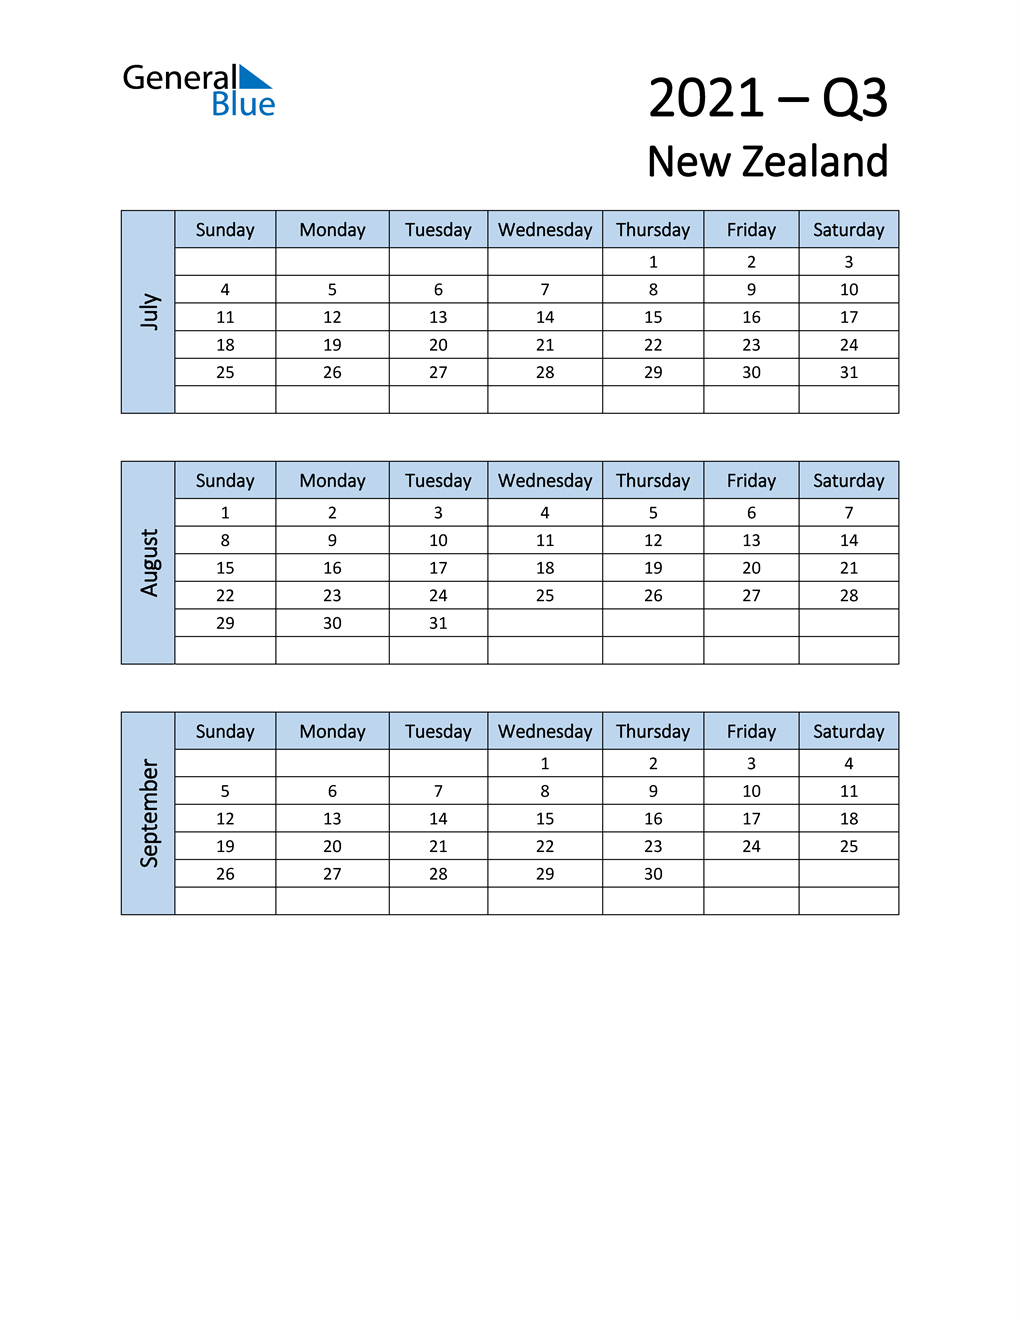 Free Q3 2021 Calendar for New Zealand